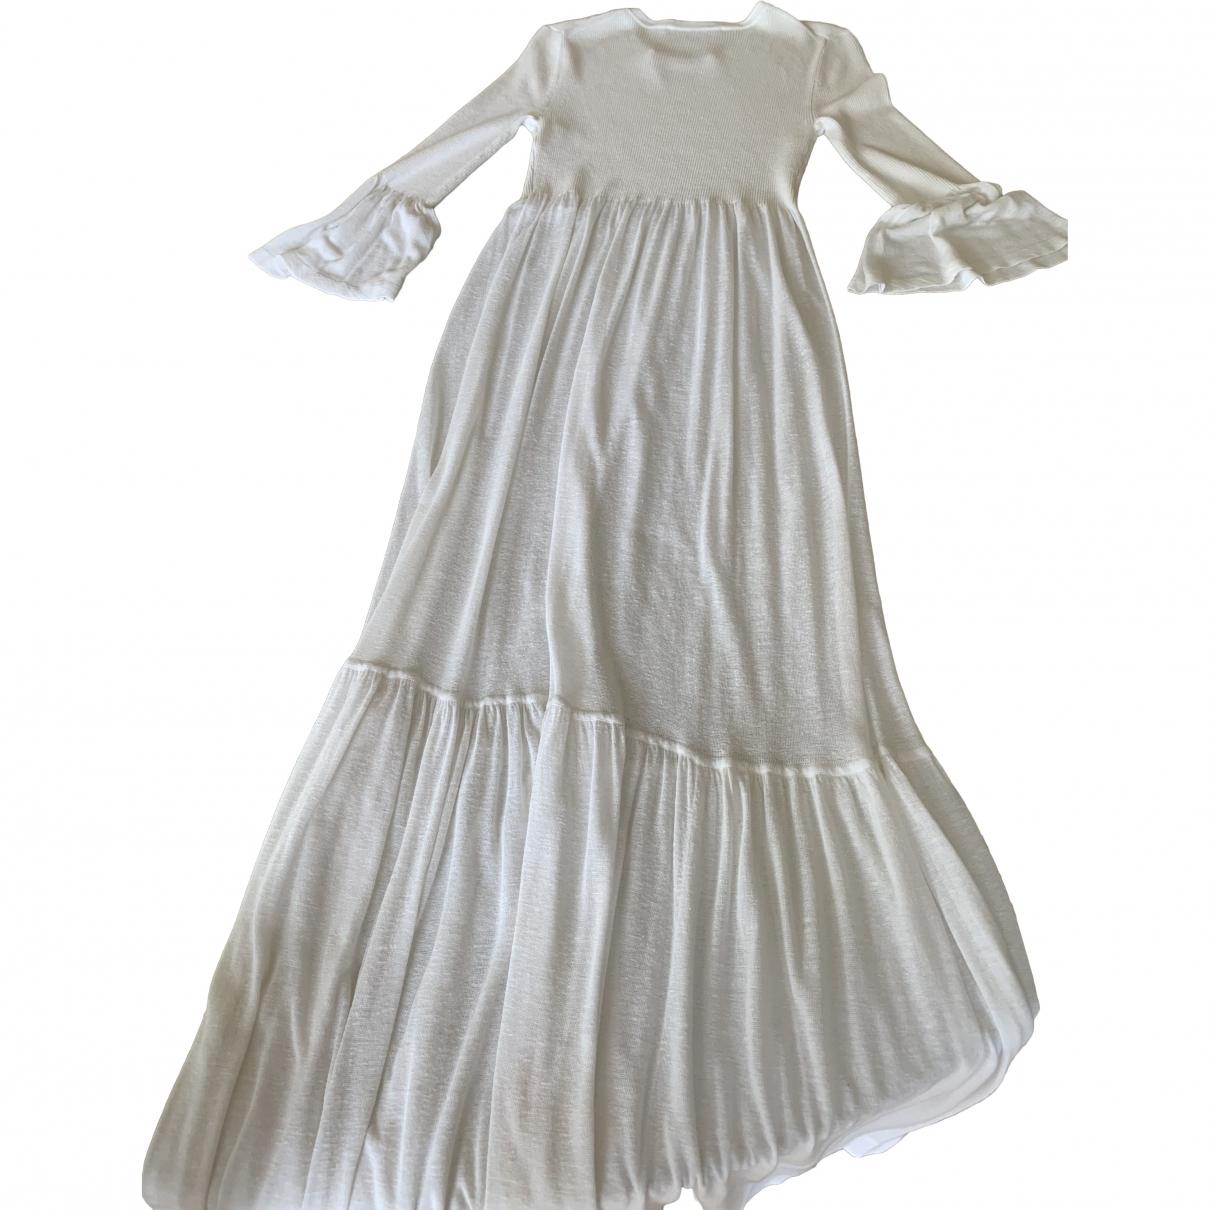 Michael Kors \N Ecru dress for Women S International